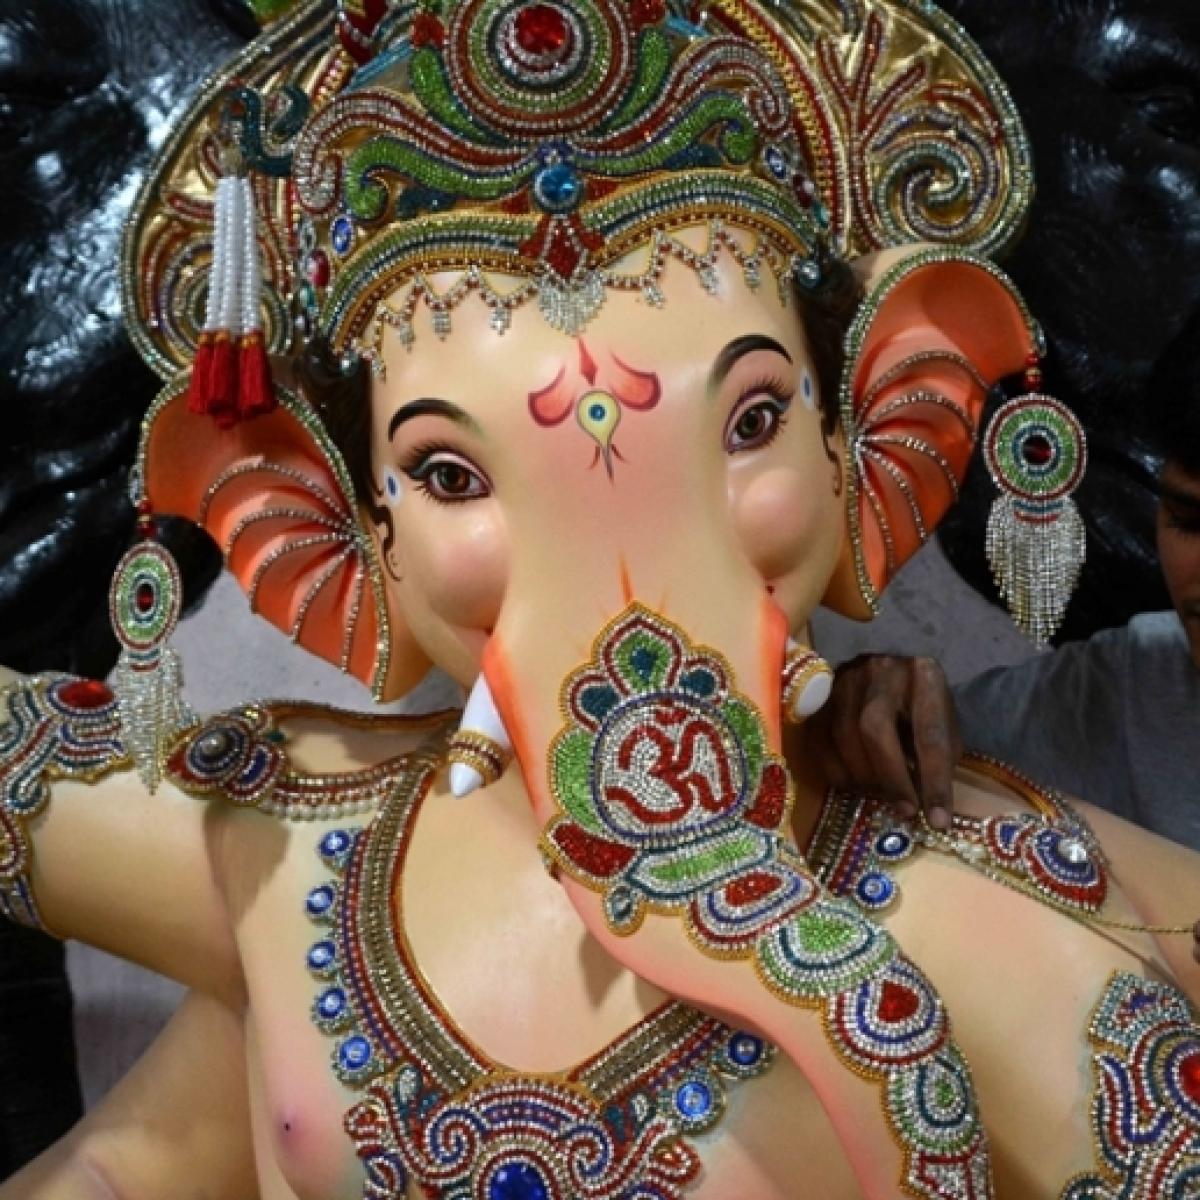 Low-key Ganapati festival in Mumbai amid coronavirus outbreak, online aarti proposed